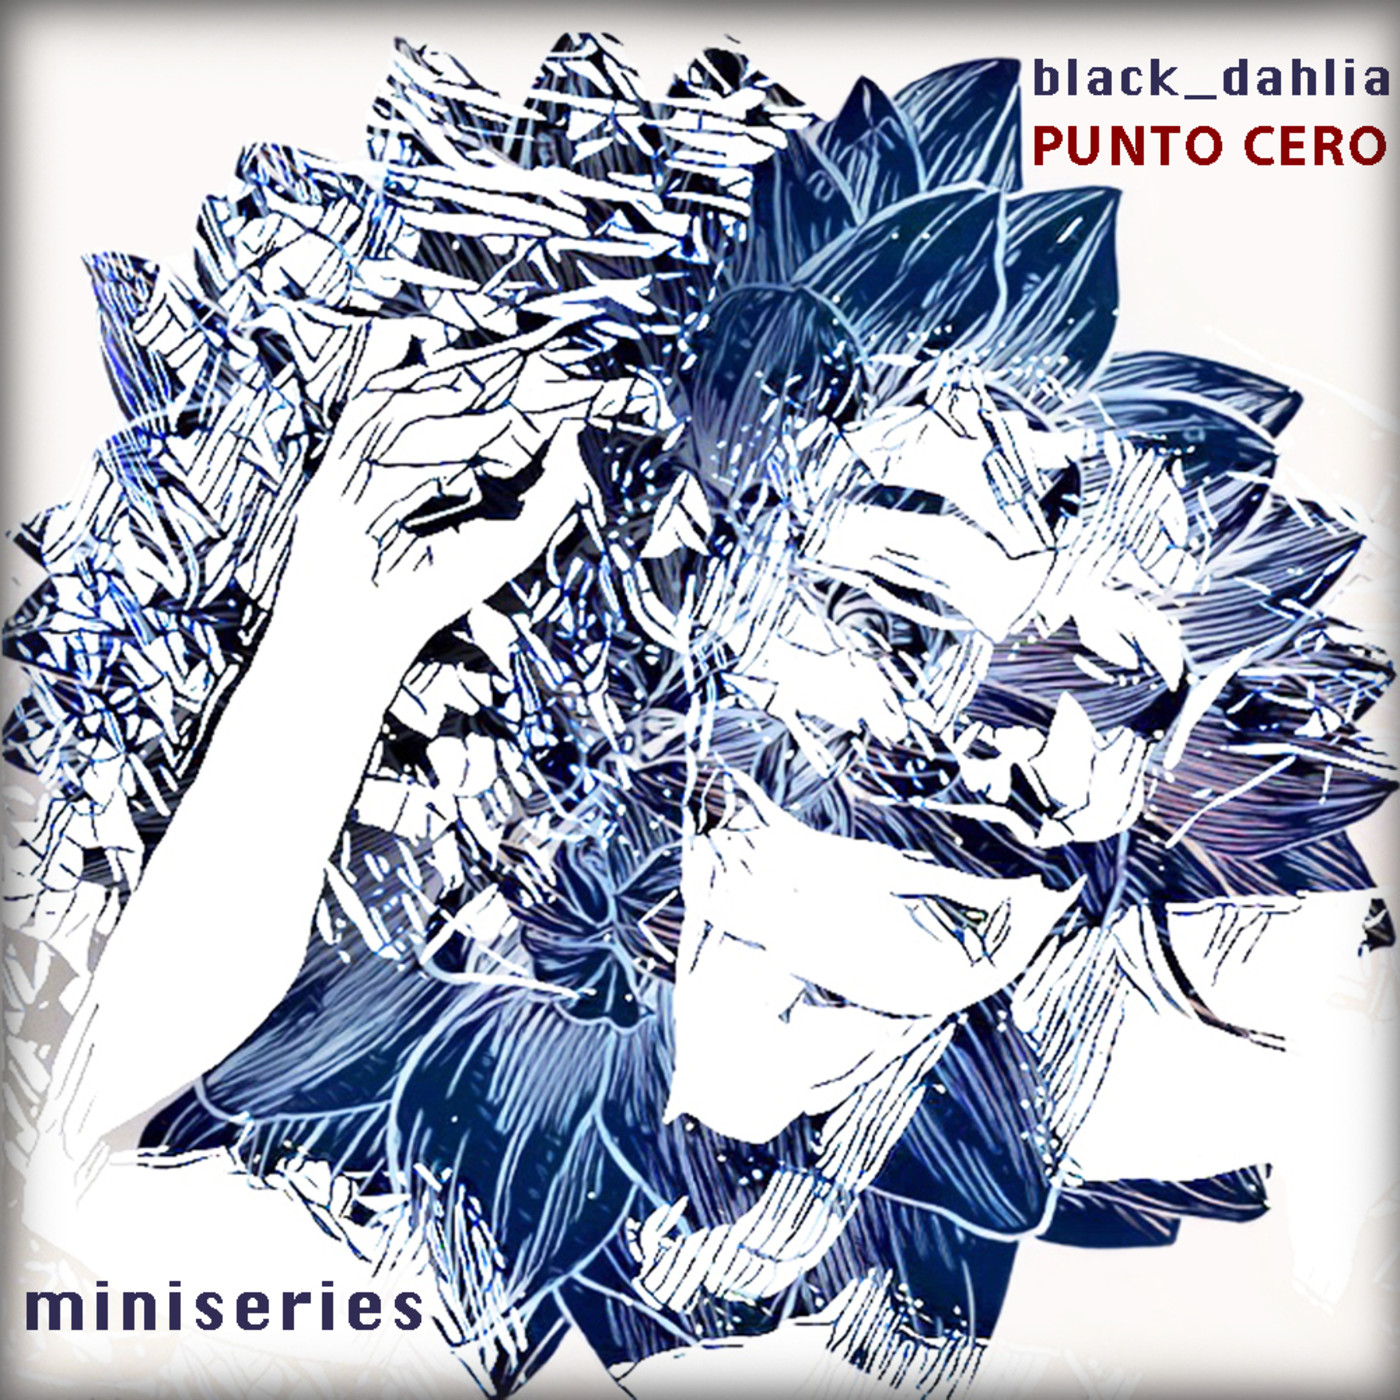 Miniseries Black Dahlia Punto Cero3 : La Espiral del Silencio (La Dalia Negra)